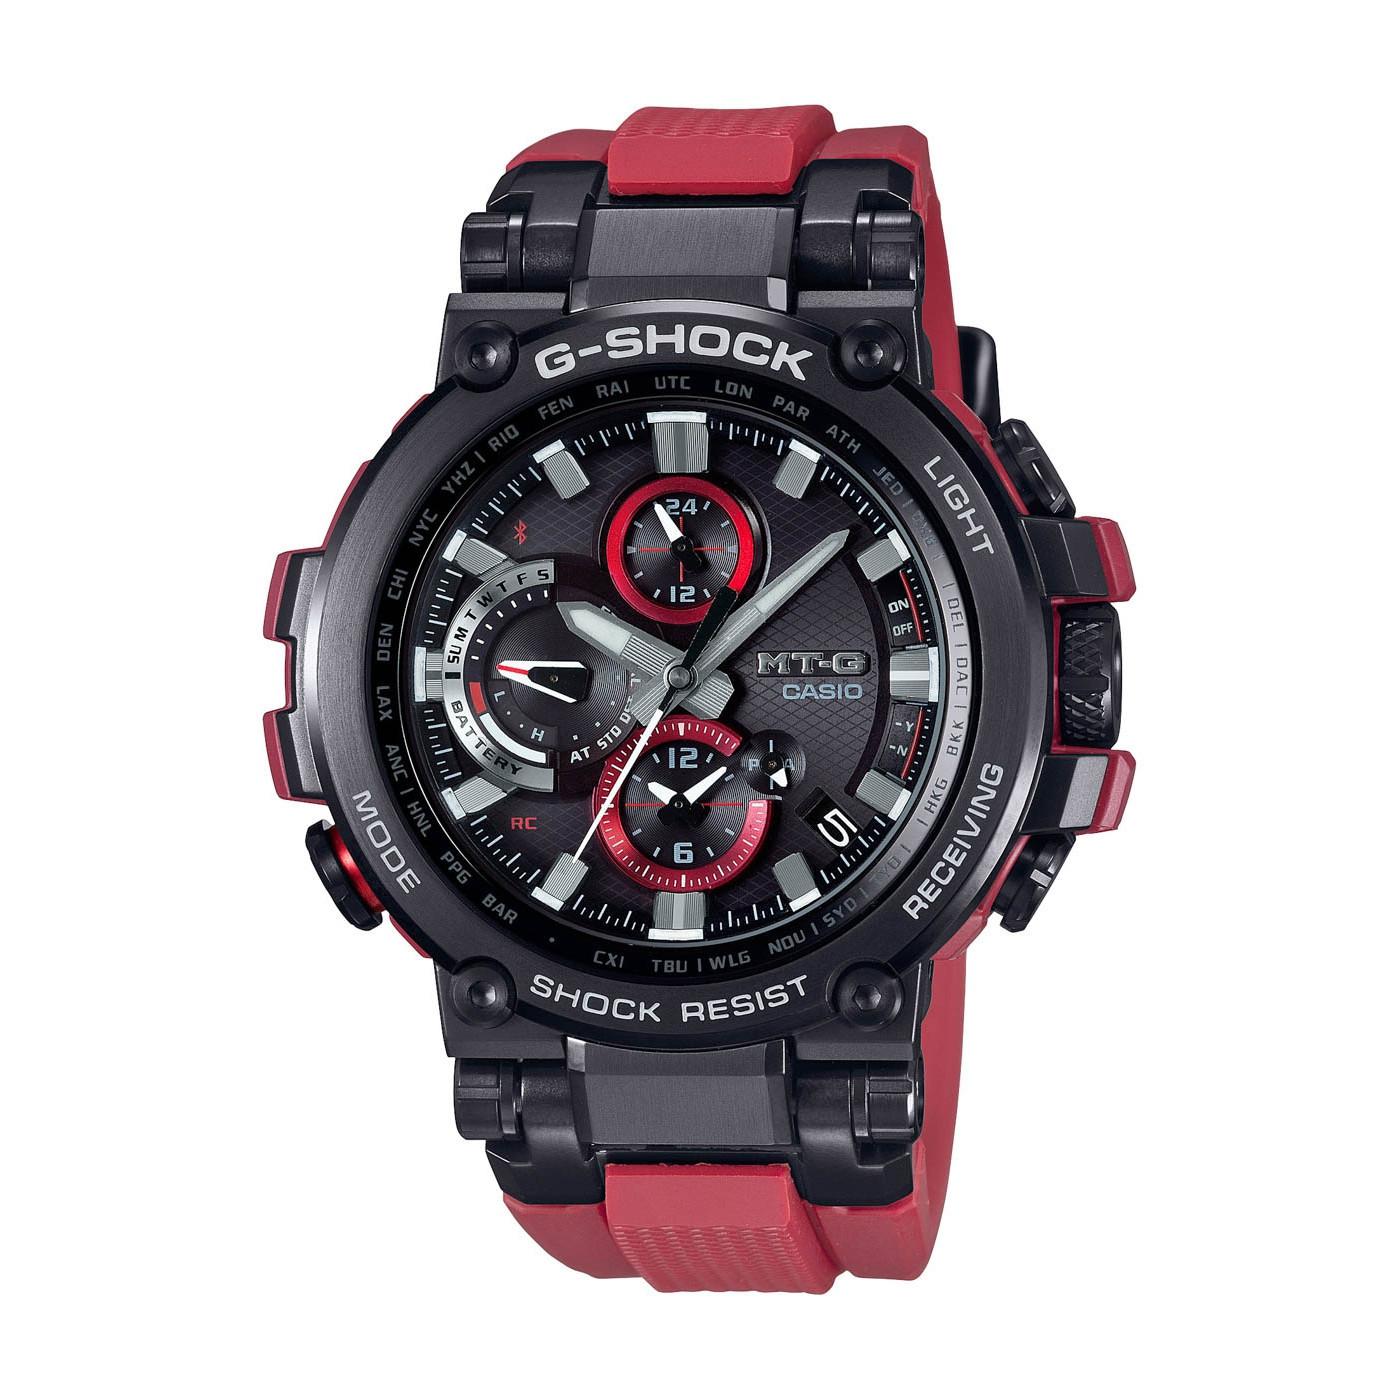 G-Shock MT-G Metal Twisted Bluetooth Solar horloge MTG-B1000B-1A4ER